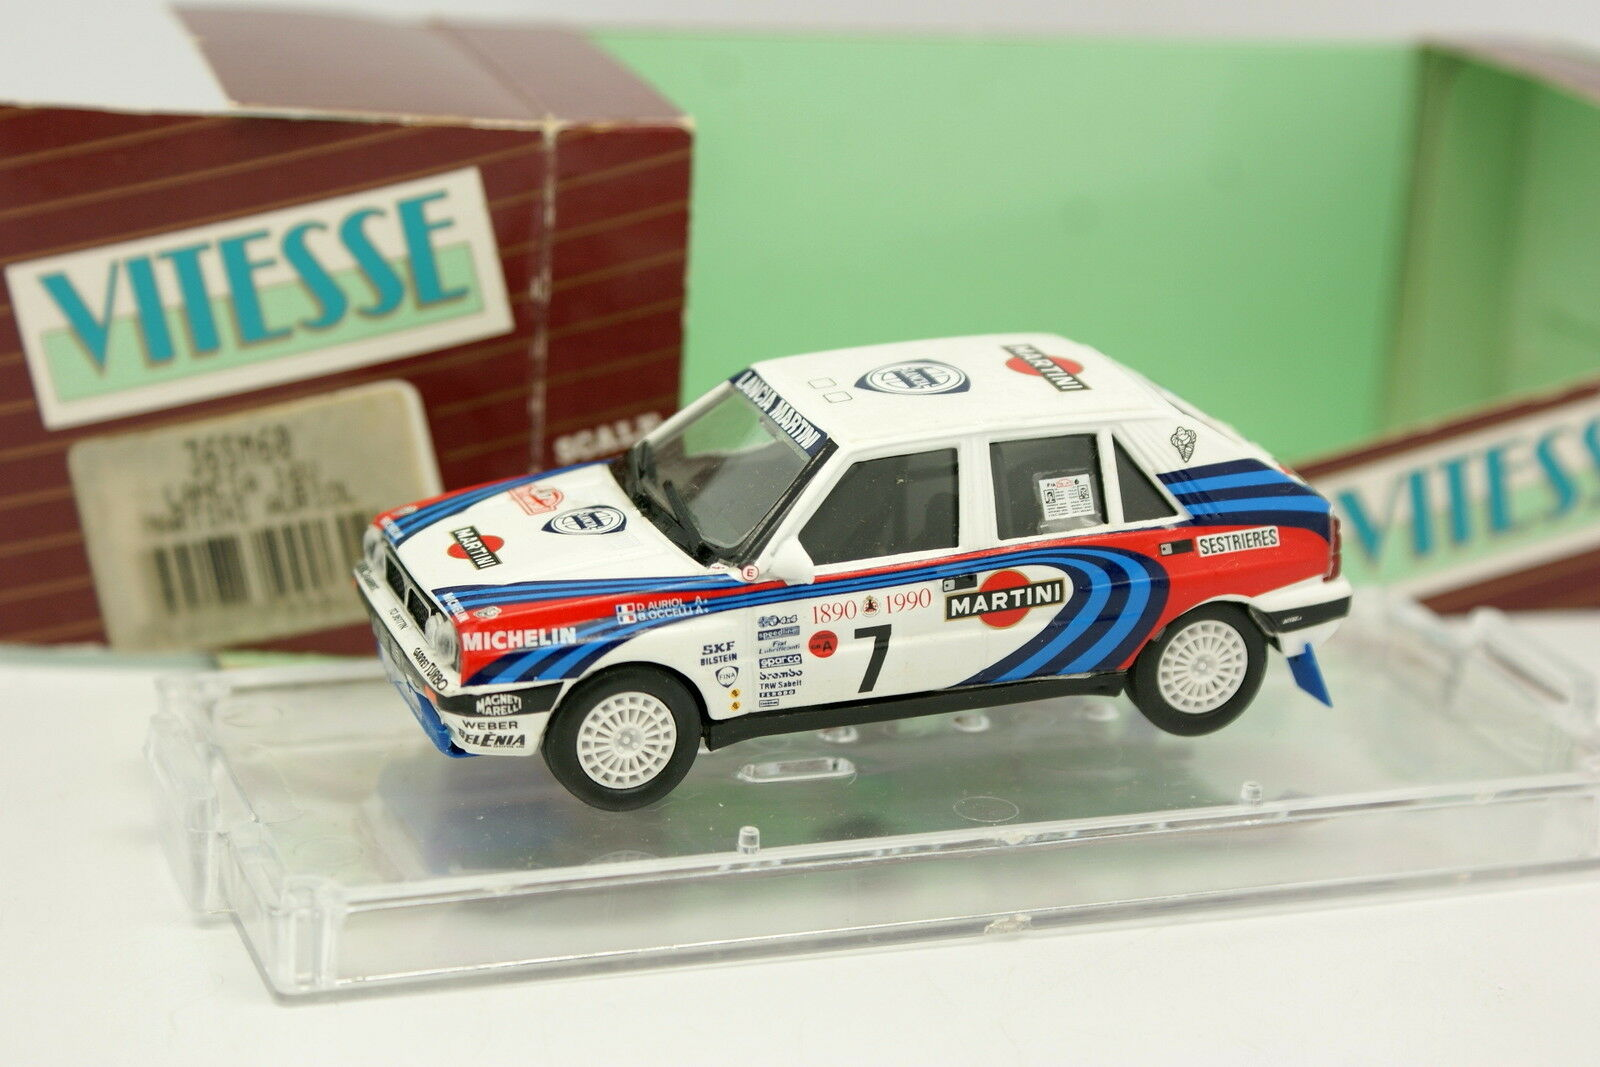 Vitesse 1 43 - Lancia Delta HF Integrale 8V Martini Rallye Monte Carlo 1990